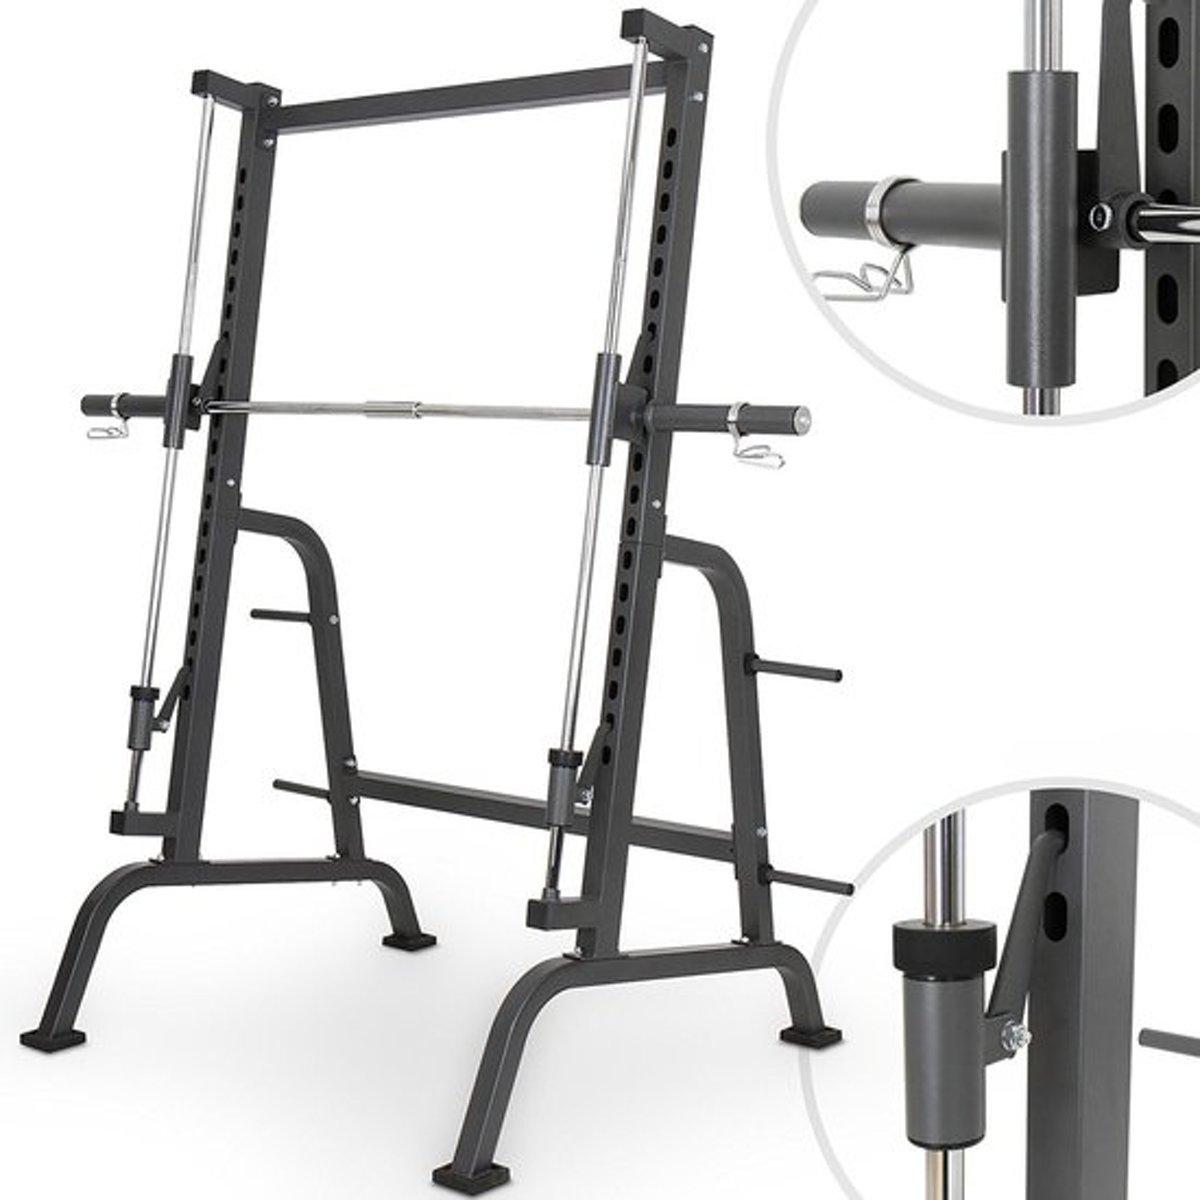 Physionics - Fitnessapparaat - Squats halterrek - Maximale belasting 250 kg kopen